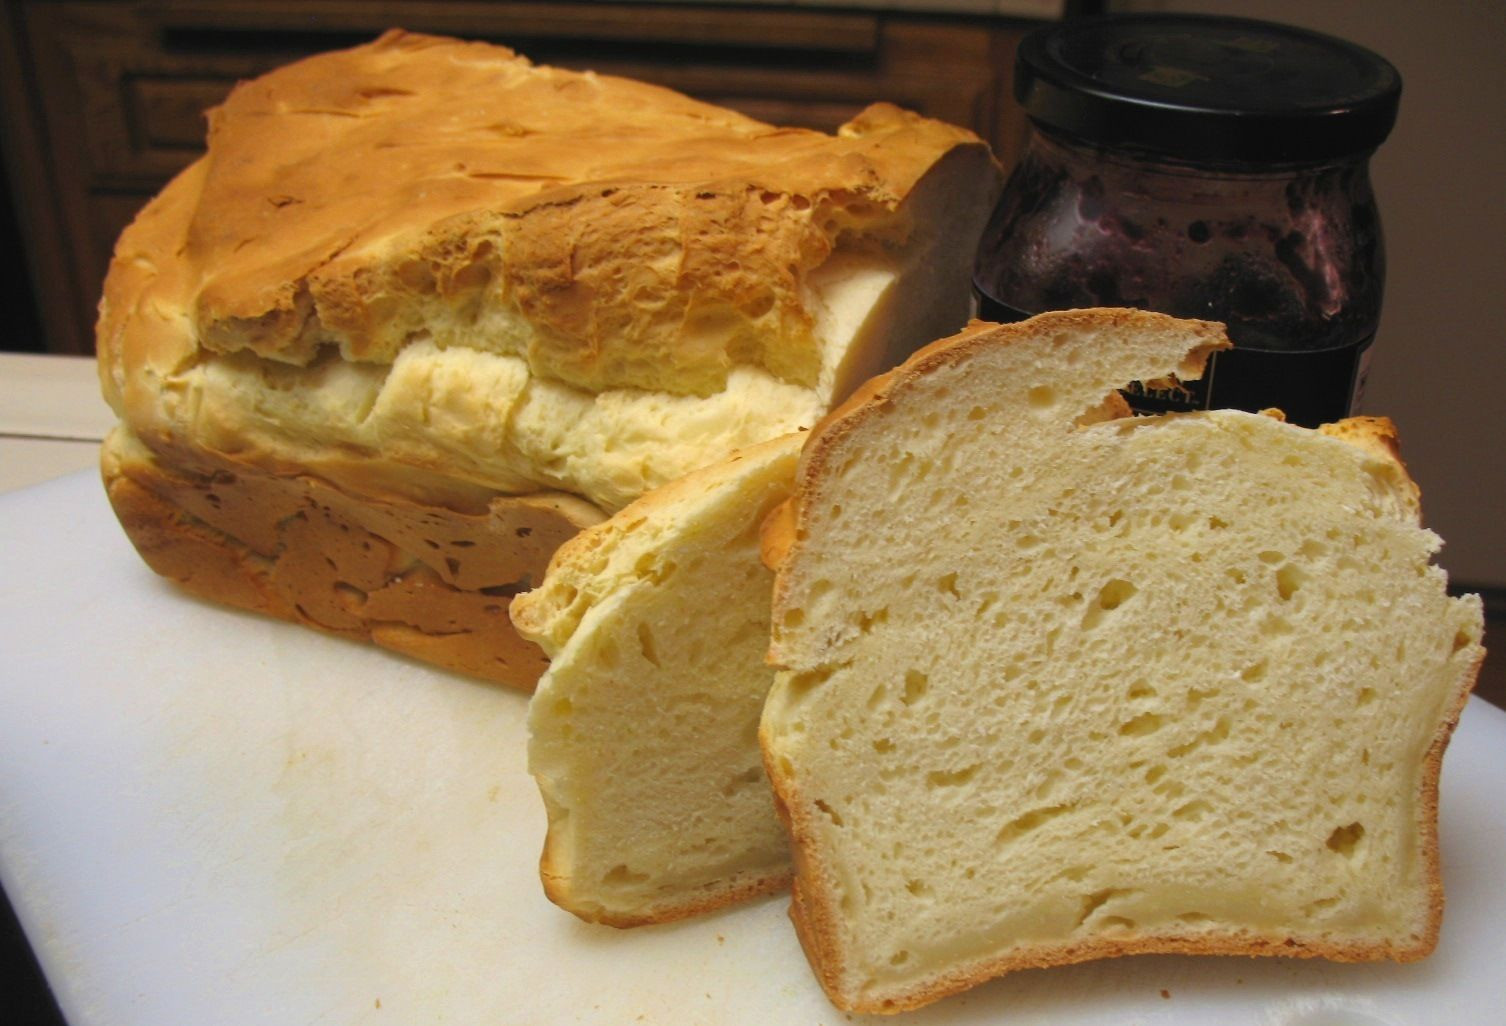 Gluten Free Buttermilk Recipes  Gluten Free Buttermilk and Honey Bread recipe – All